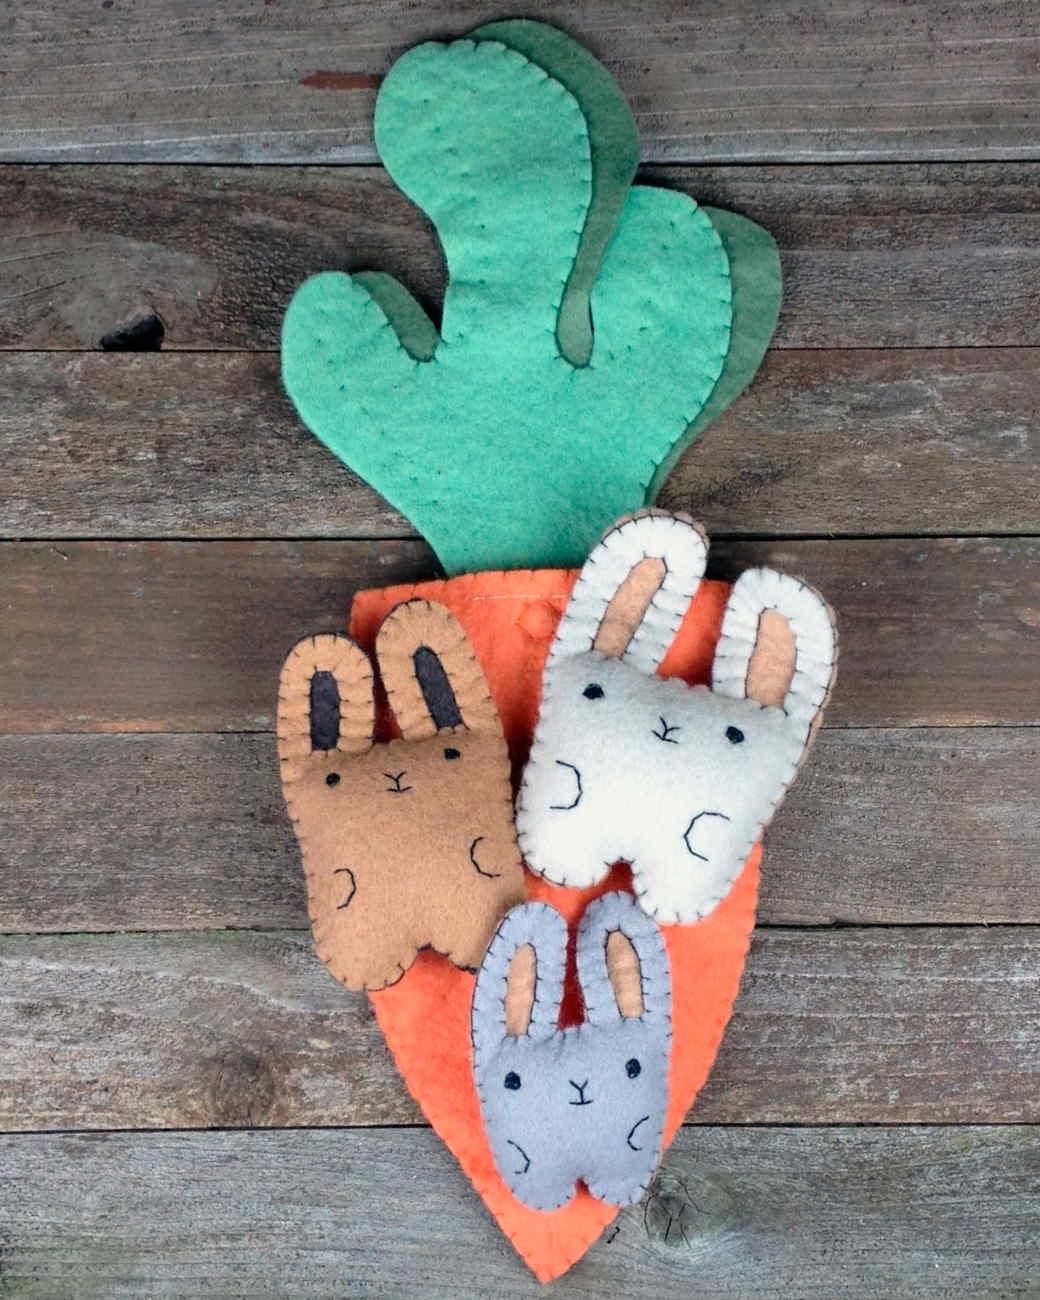 kata-golda-bunnies-carrot-0215.jpg